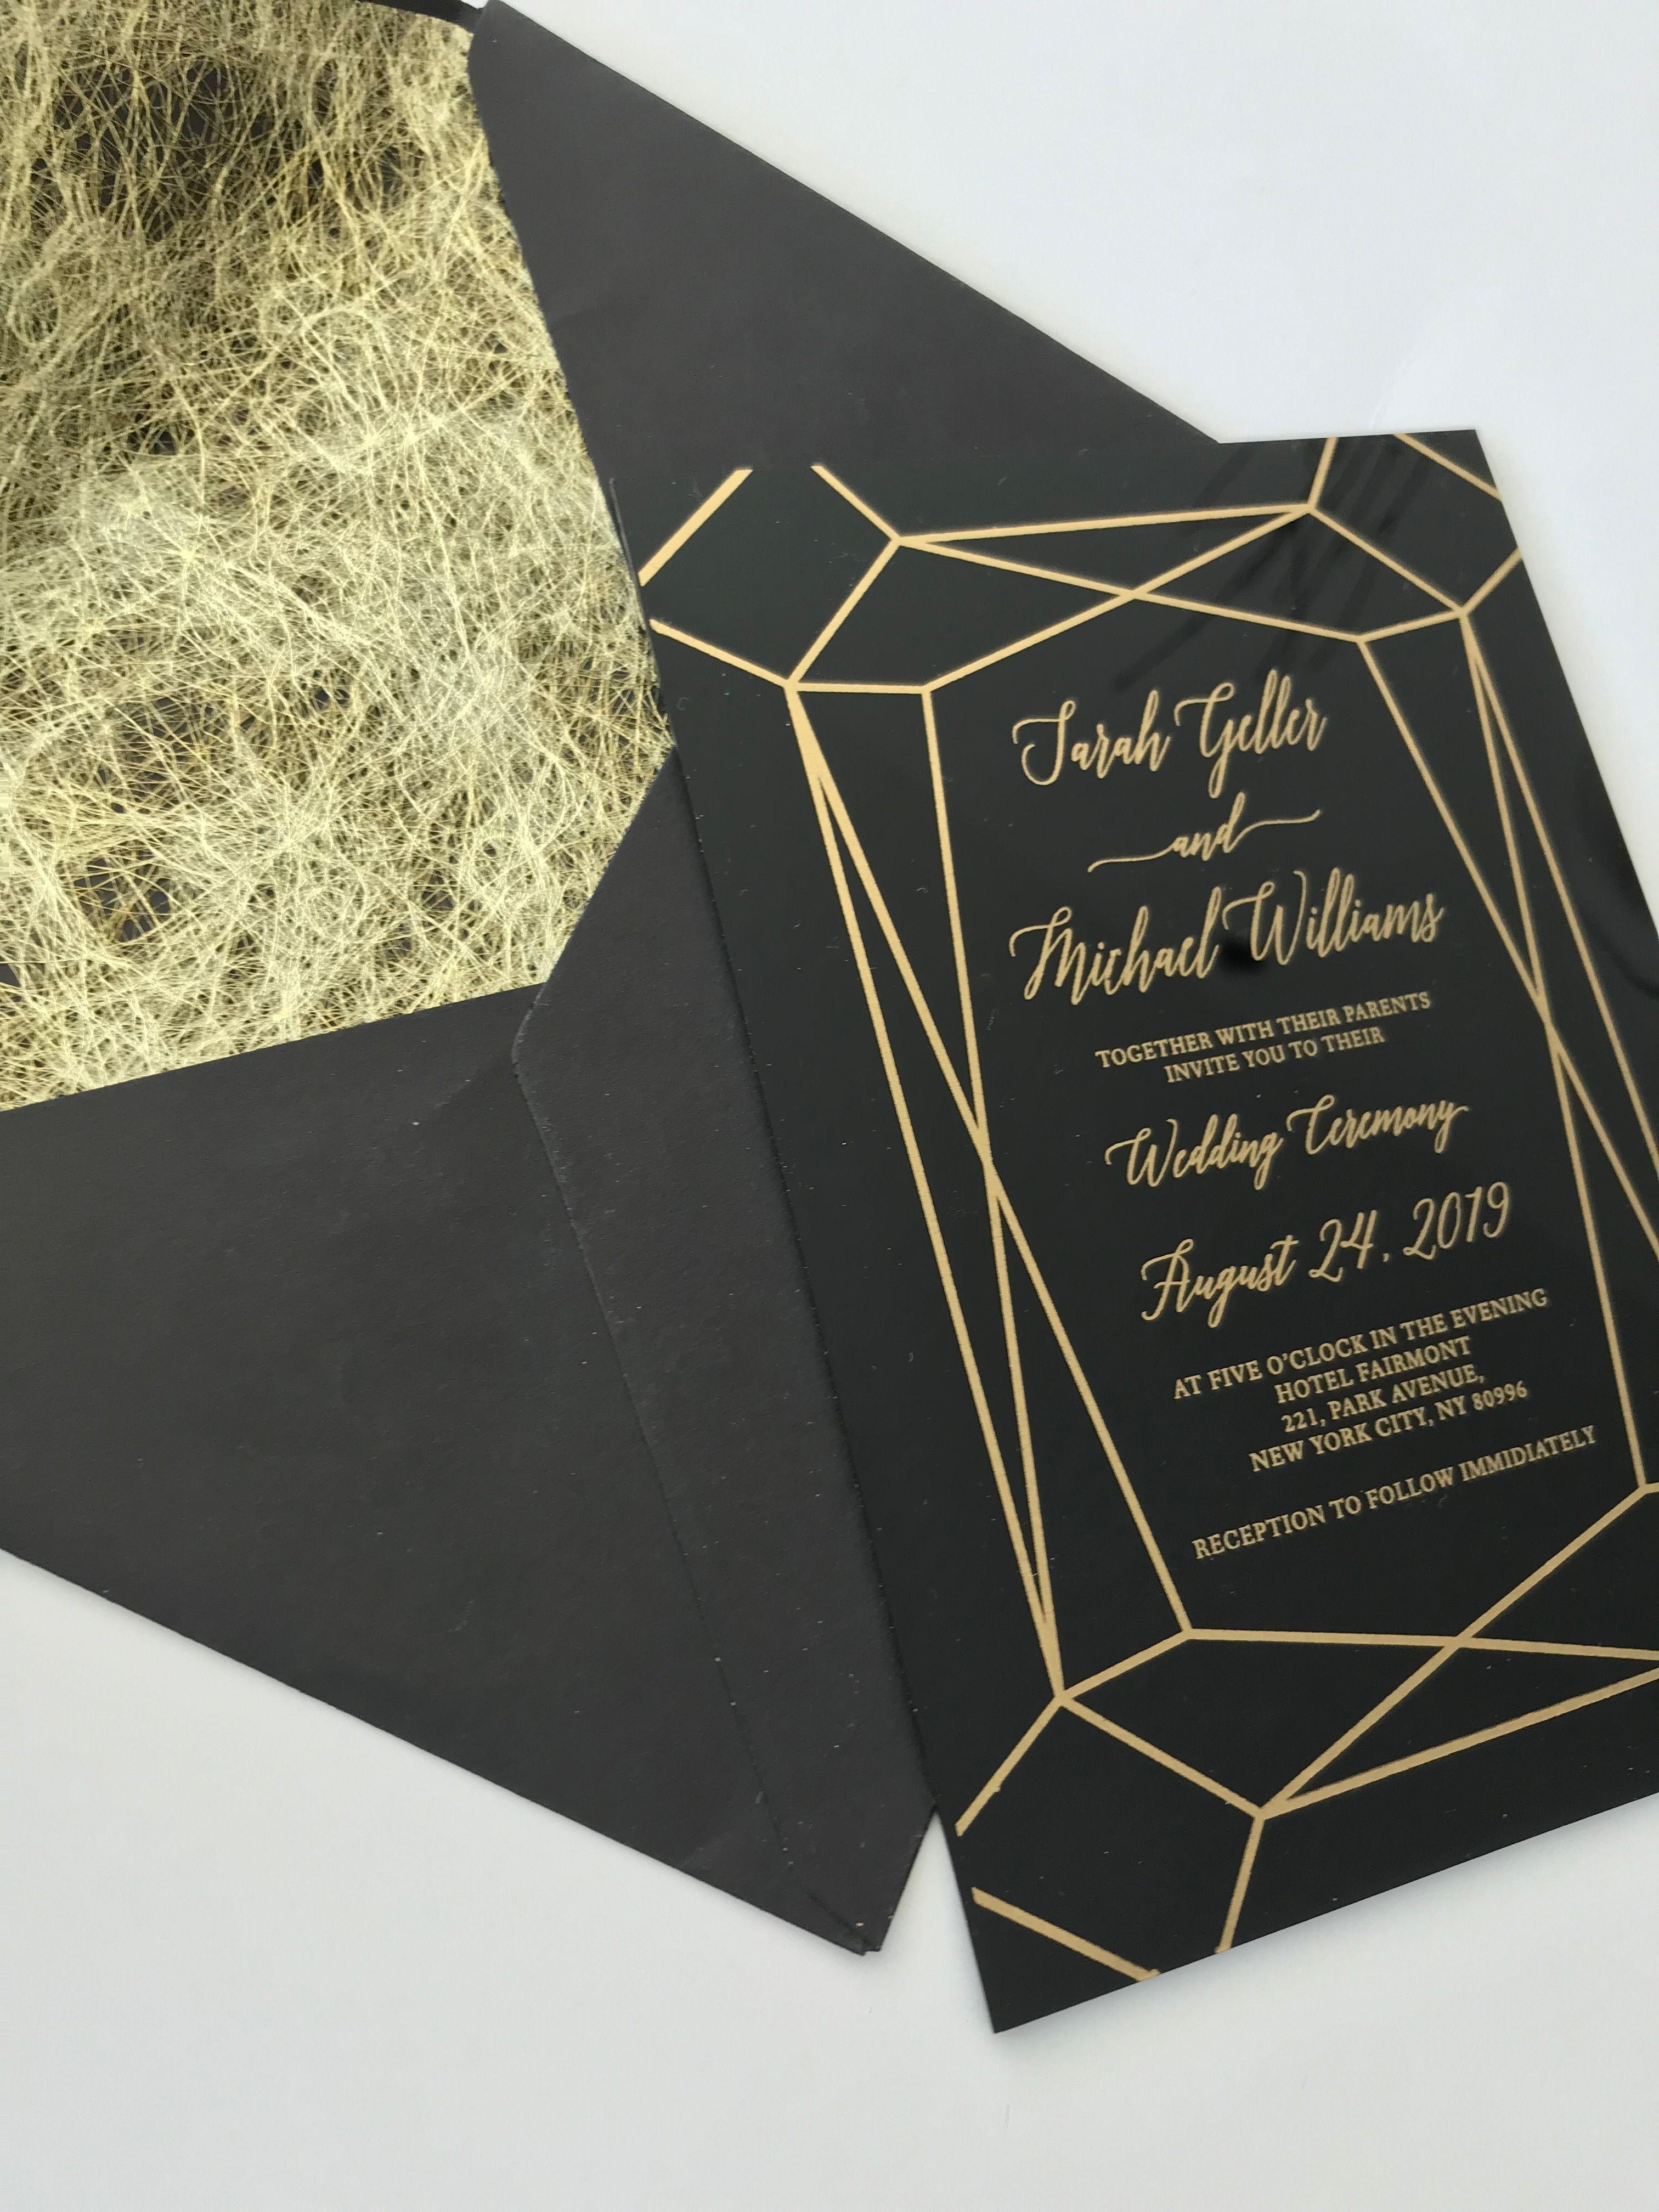 Black acrylic lucite perspex wedding invitations! So classy and great  quality! weddi…   Acrylic wedding invitations, Wedding invitations, Black  and gold invitations